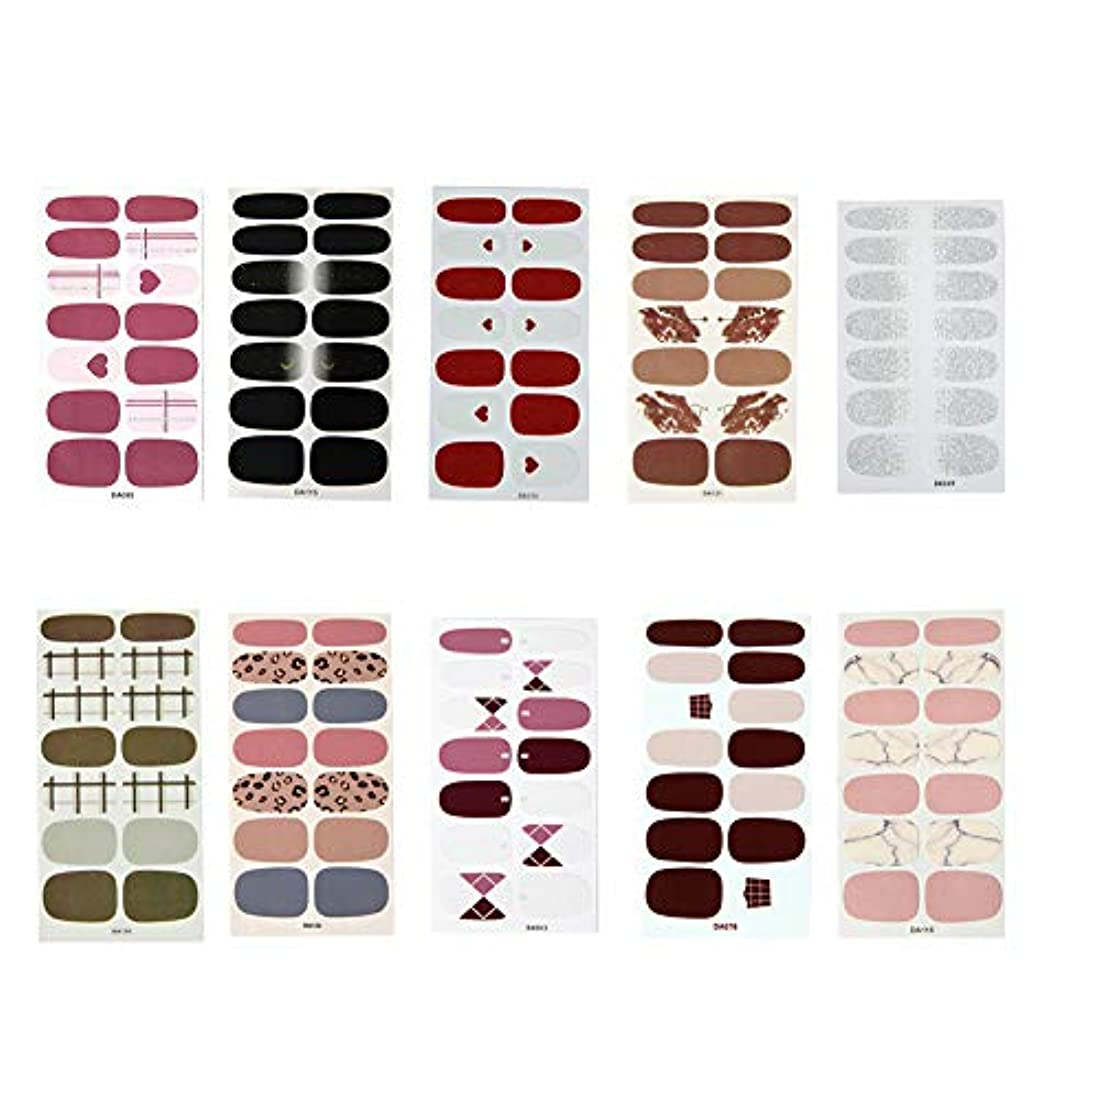 Poonikuuネイル ネイルアートアクセサリー 貼るだけマニキュア DIYネイルステッカー DIYネイルシール 優雅可愛い綺麗 10枚10類